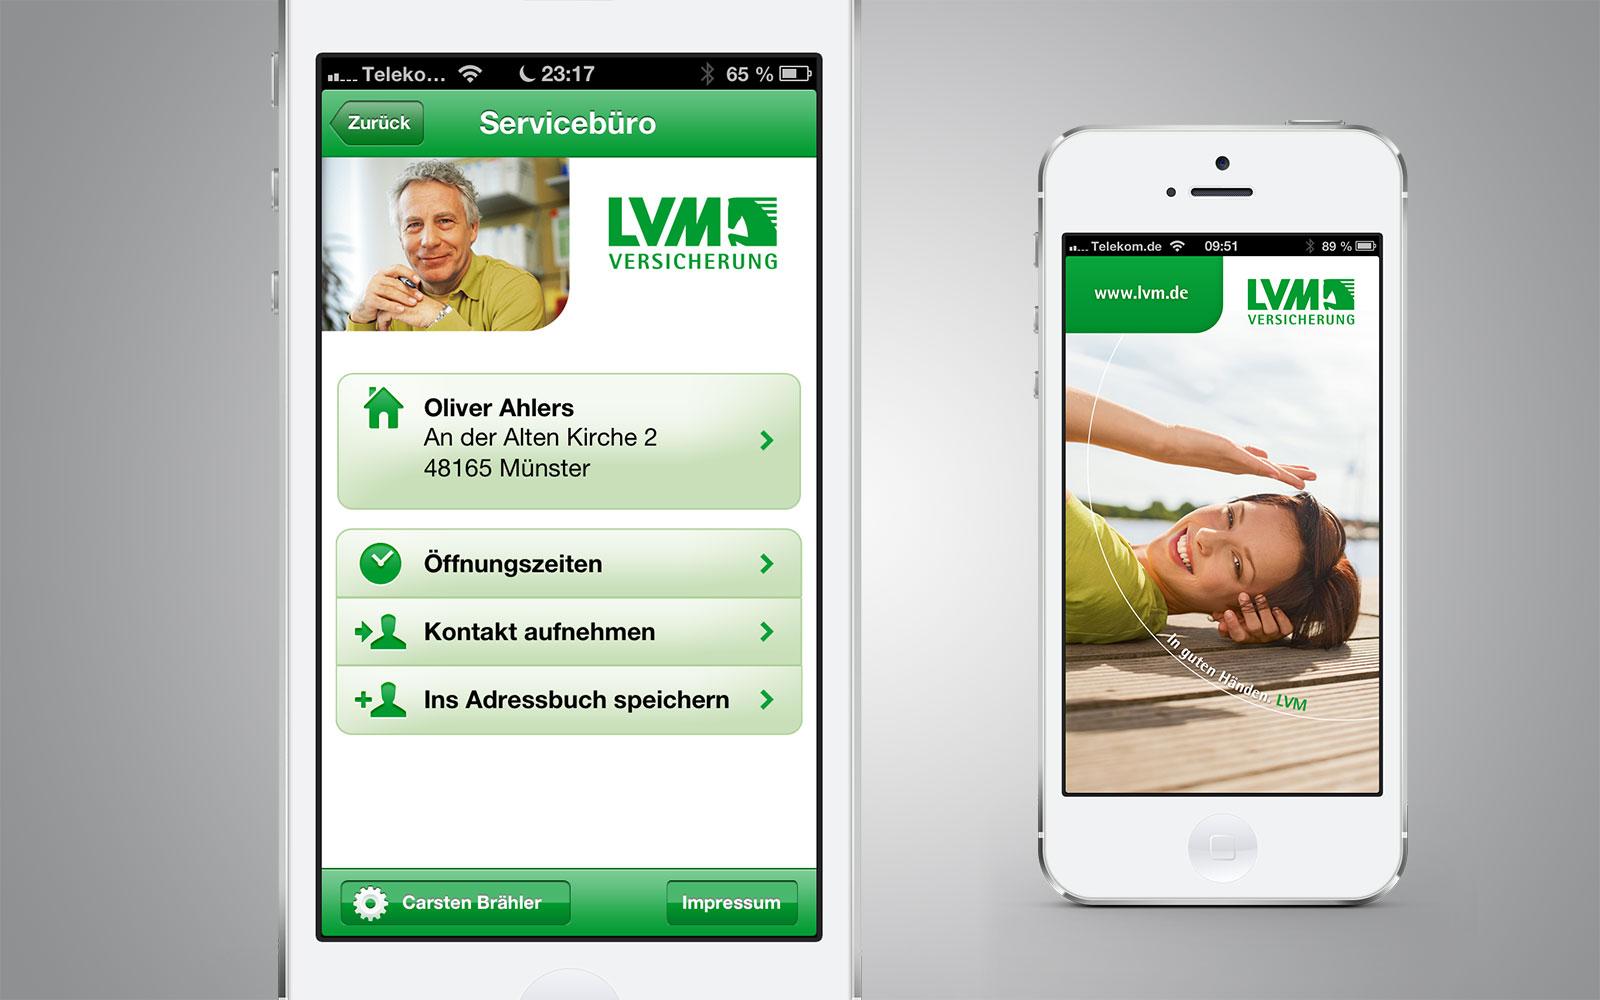 lvm_app_1600p_visual_6